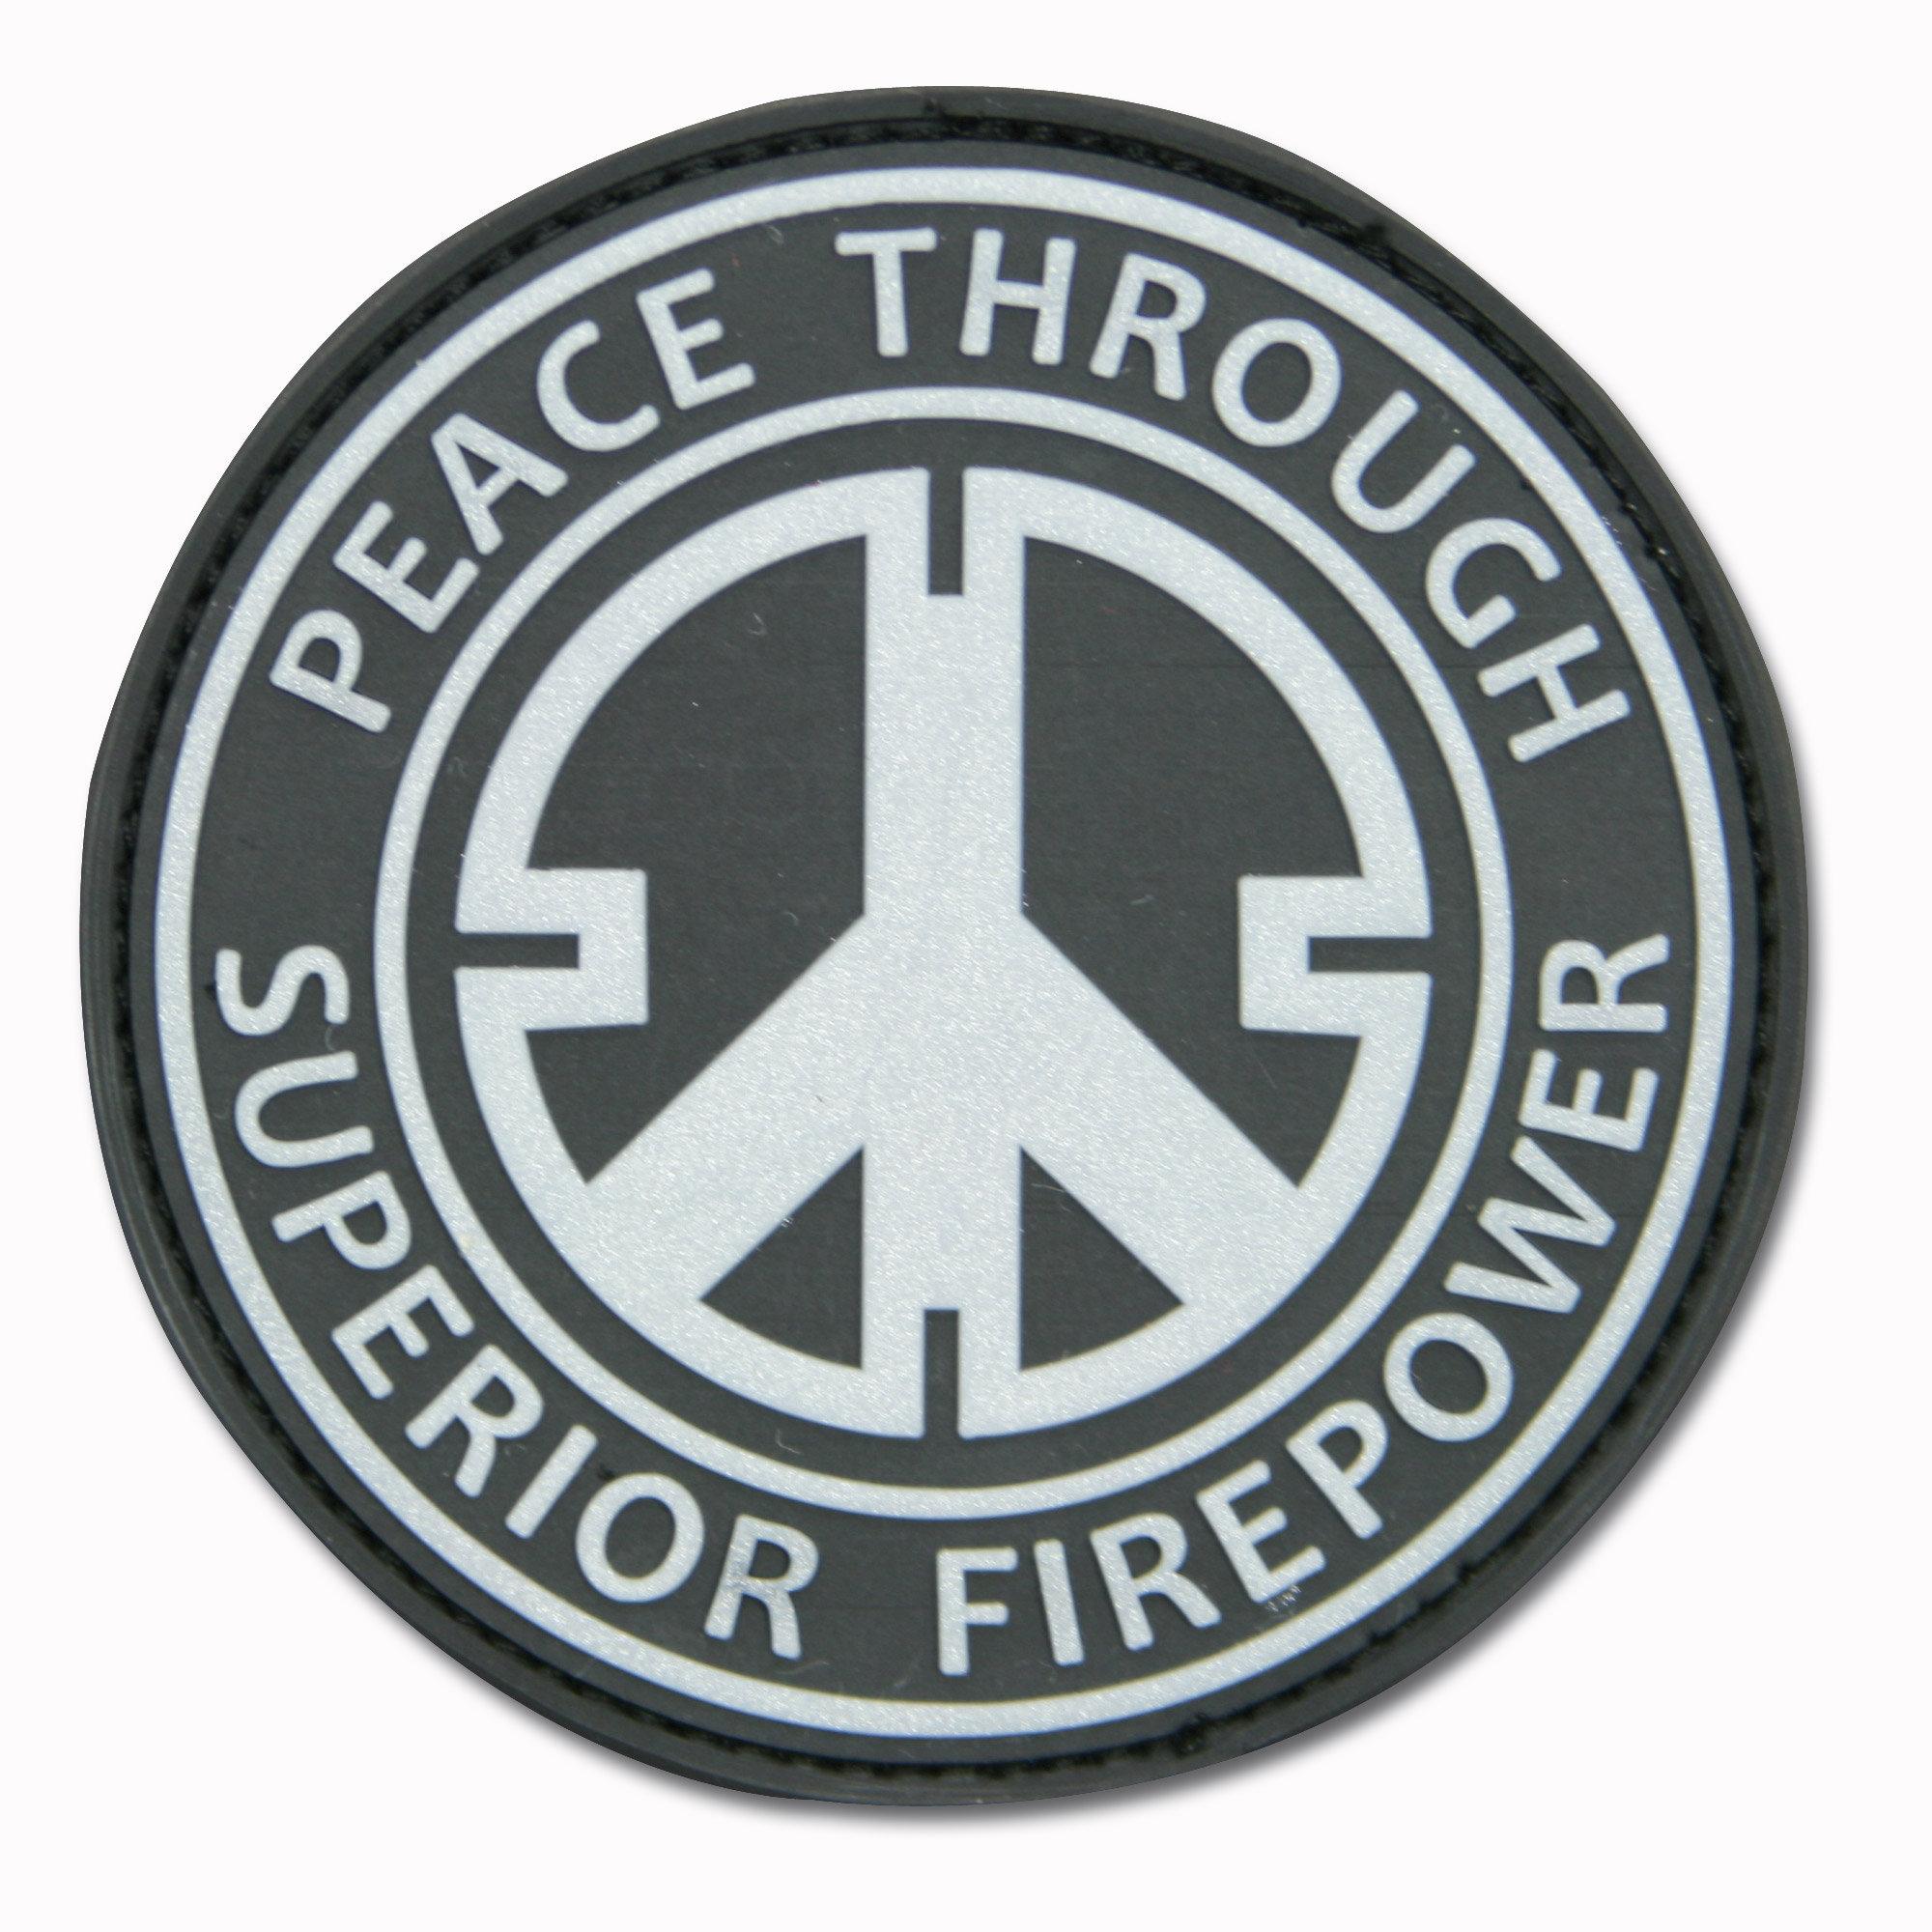 Parche 3D Peace Through Superior Firepower negro